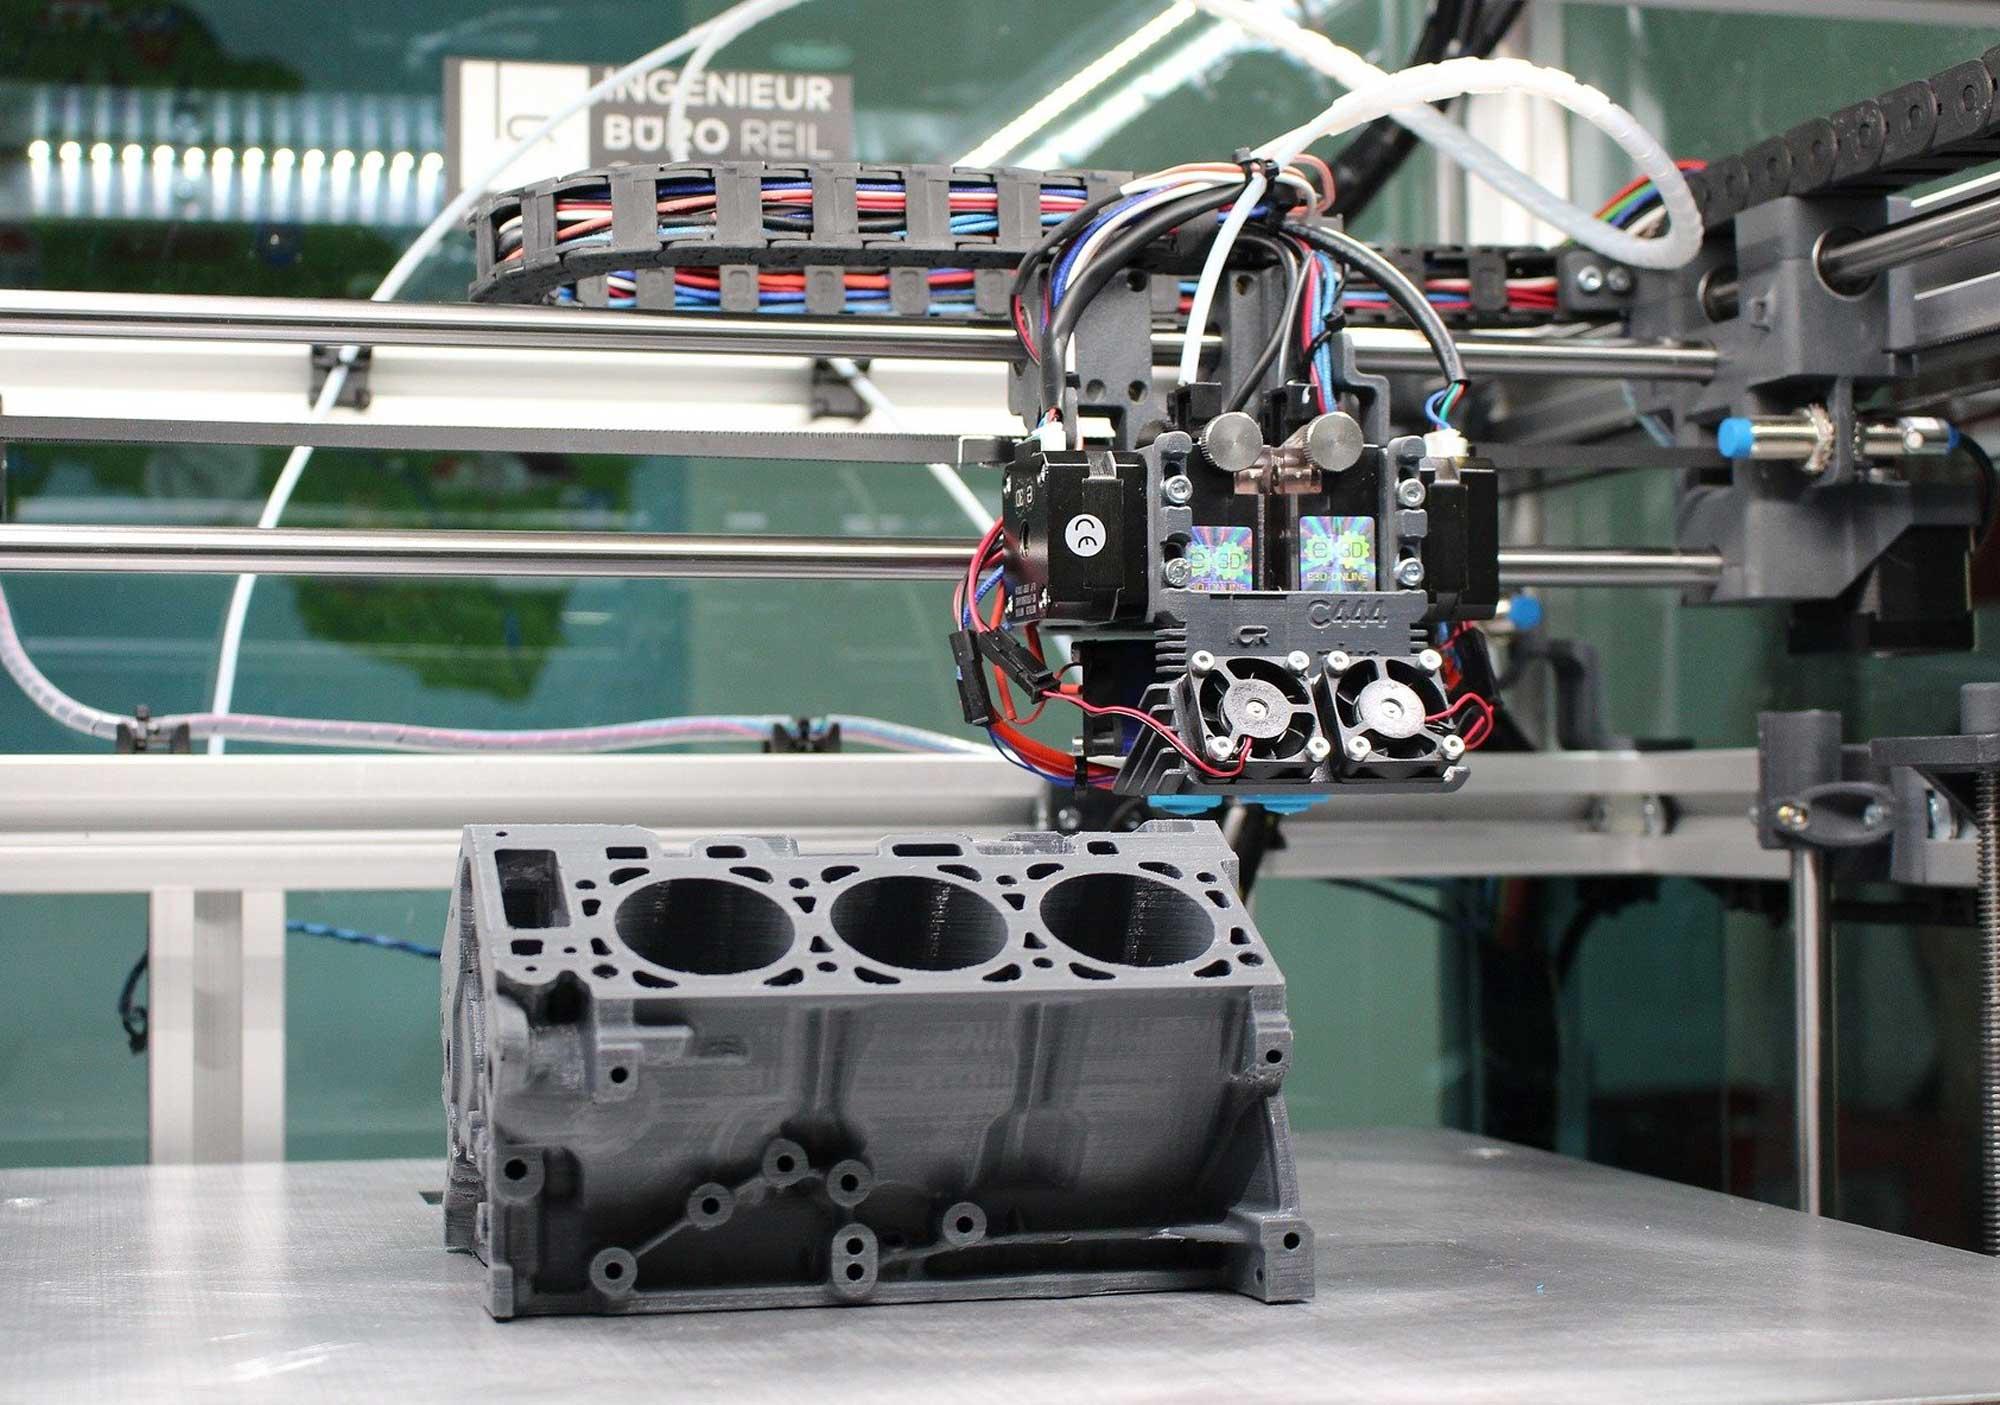 3d-printing-engine-prototype